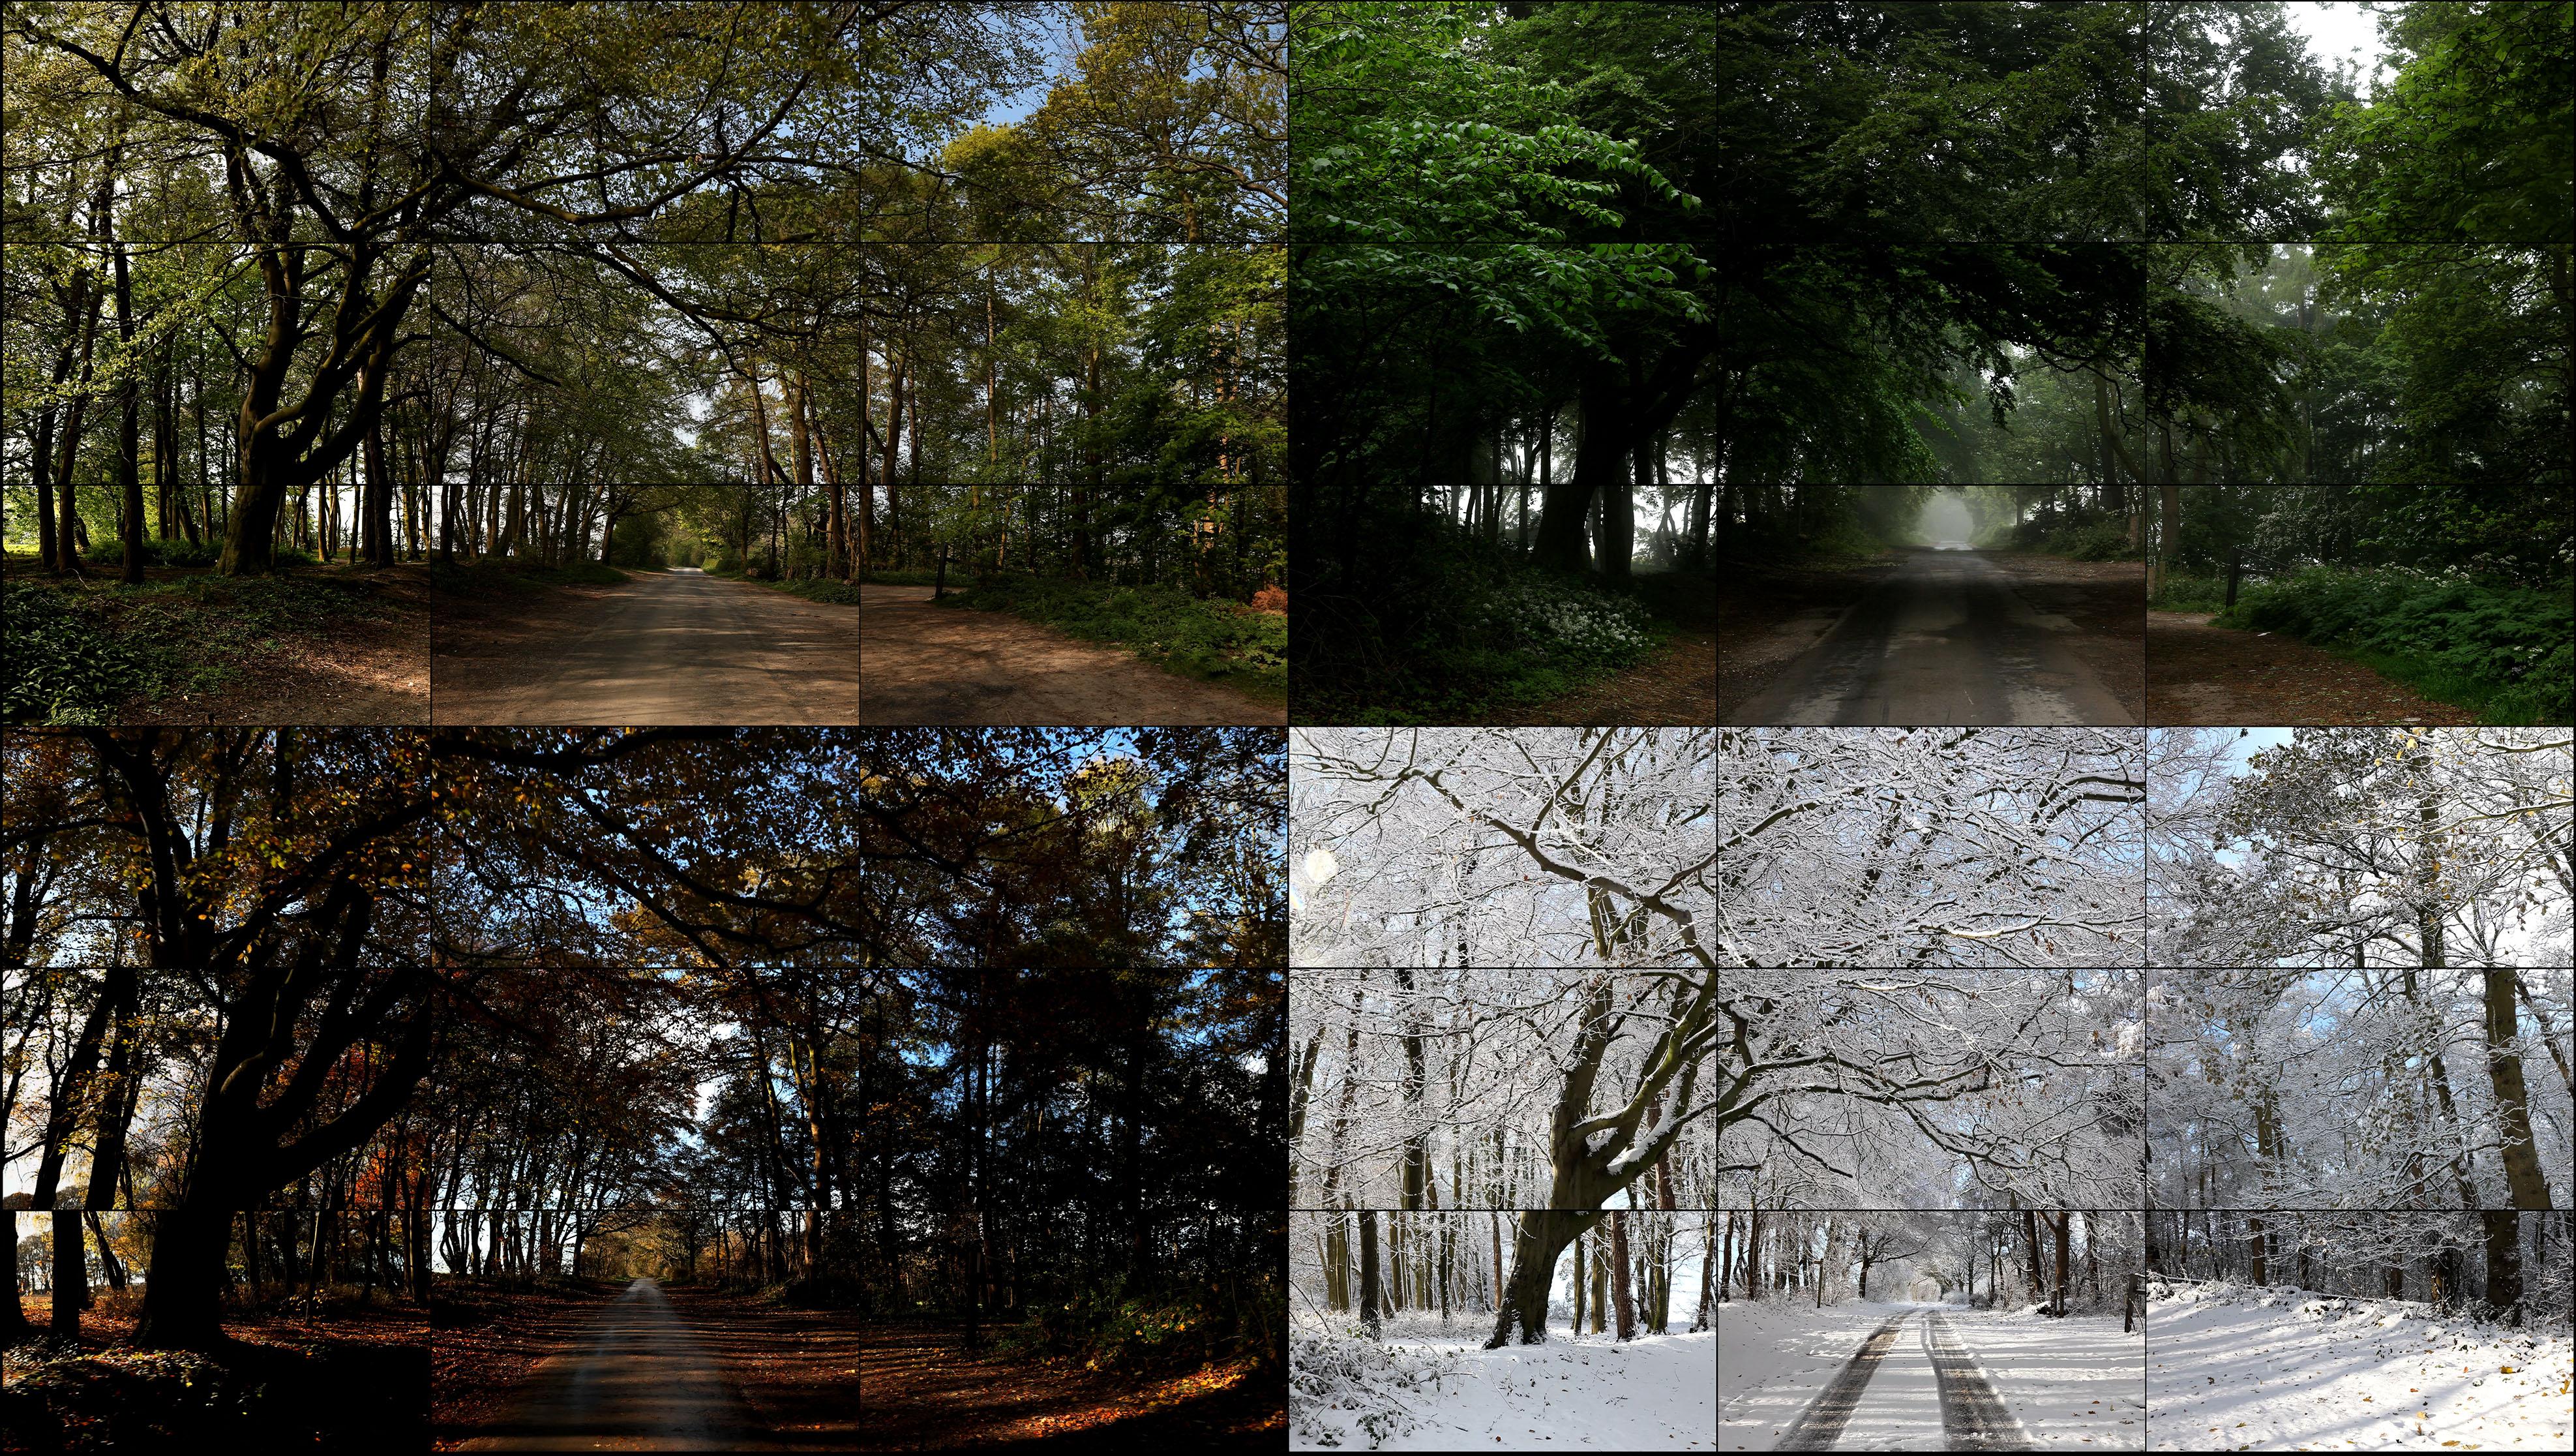 17David Hockney The Four Seasons Woldgate Woods 2010-2011 36 vidéos numériques © David Hockney - Copie.jpg